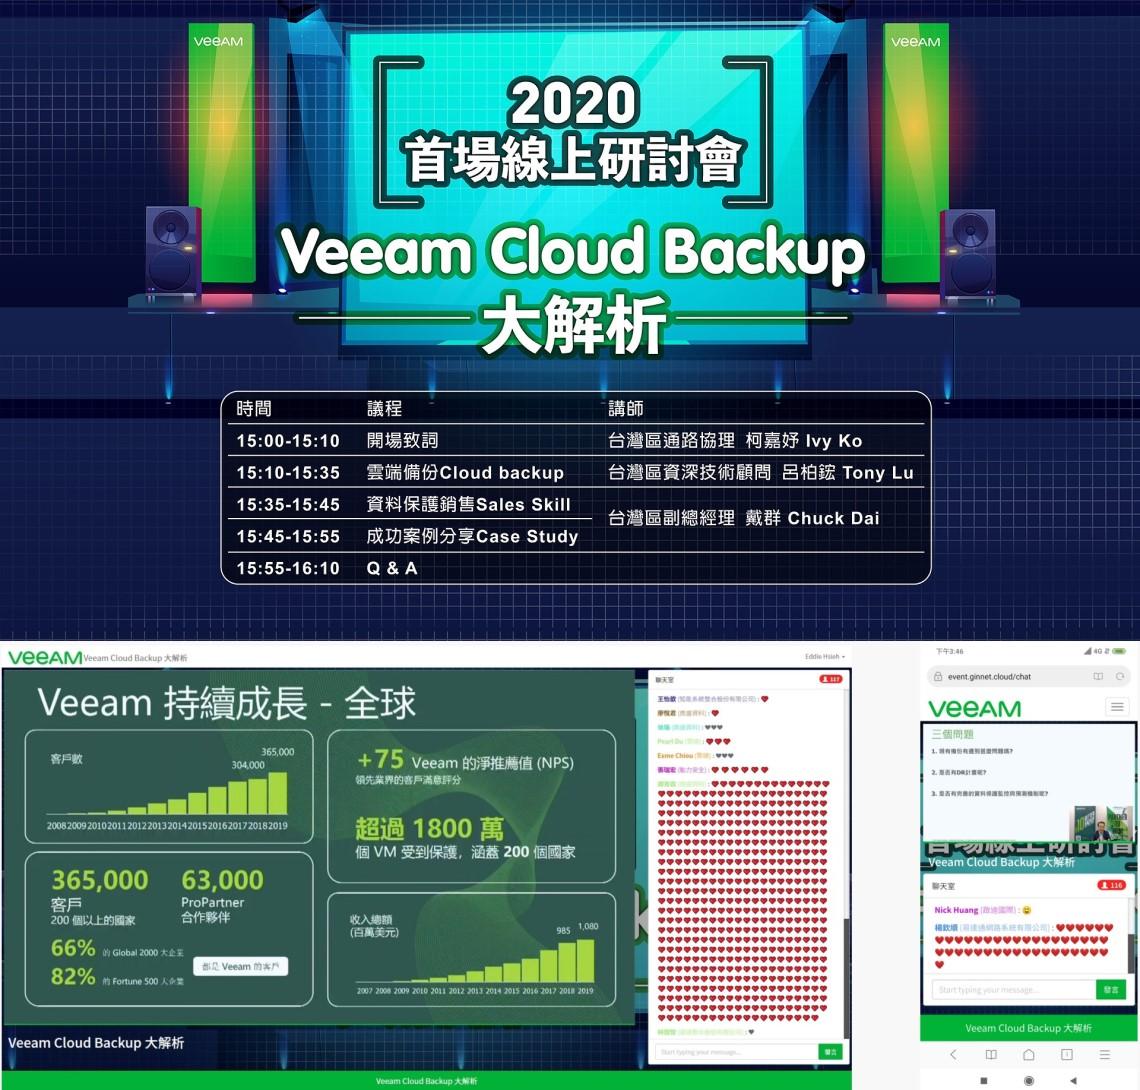 Veeam Cloud Backup 大解析 網路研討會